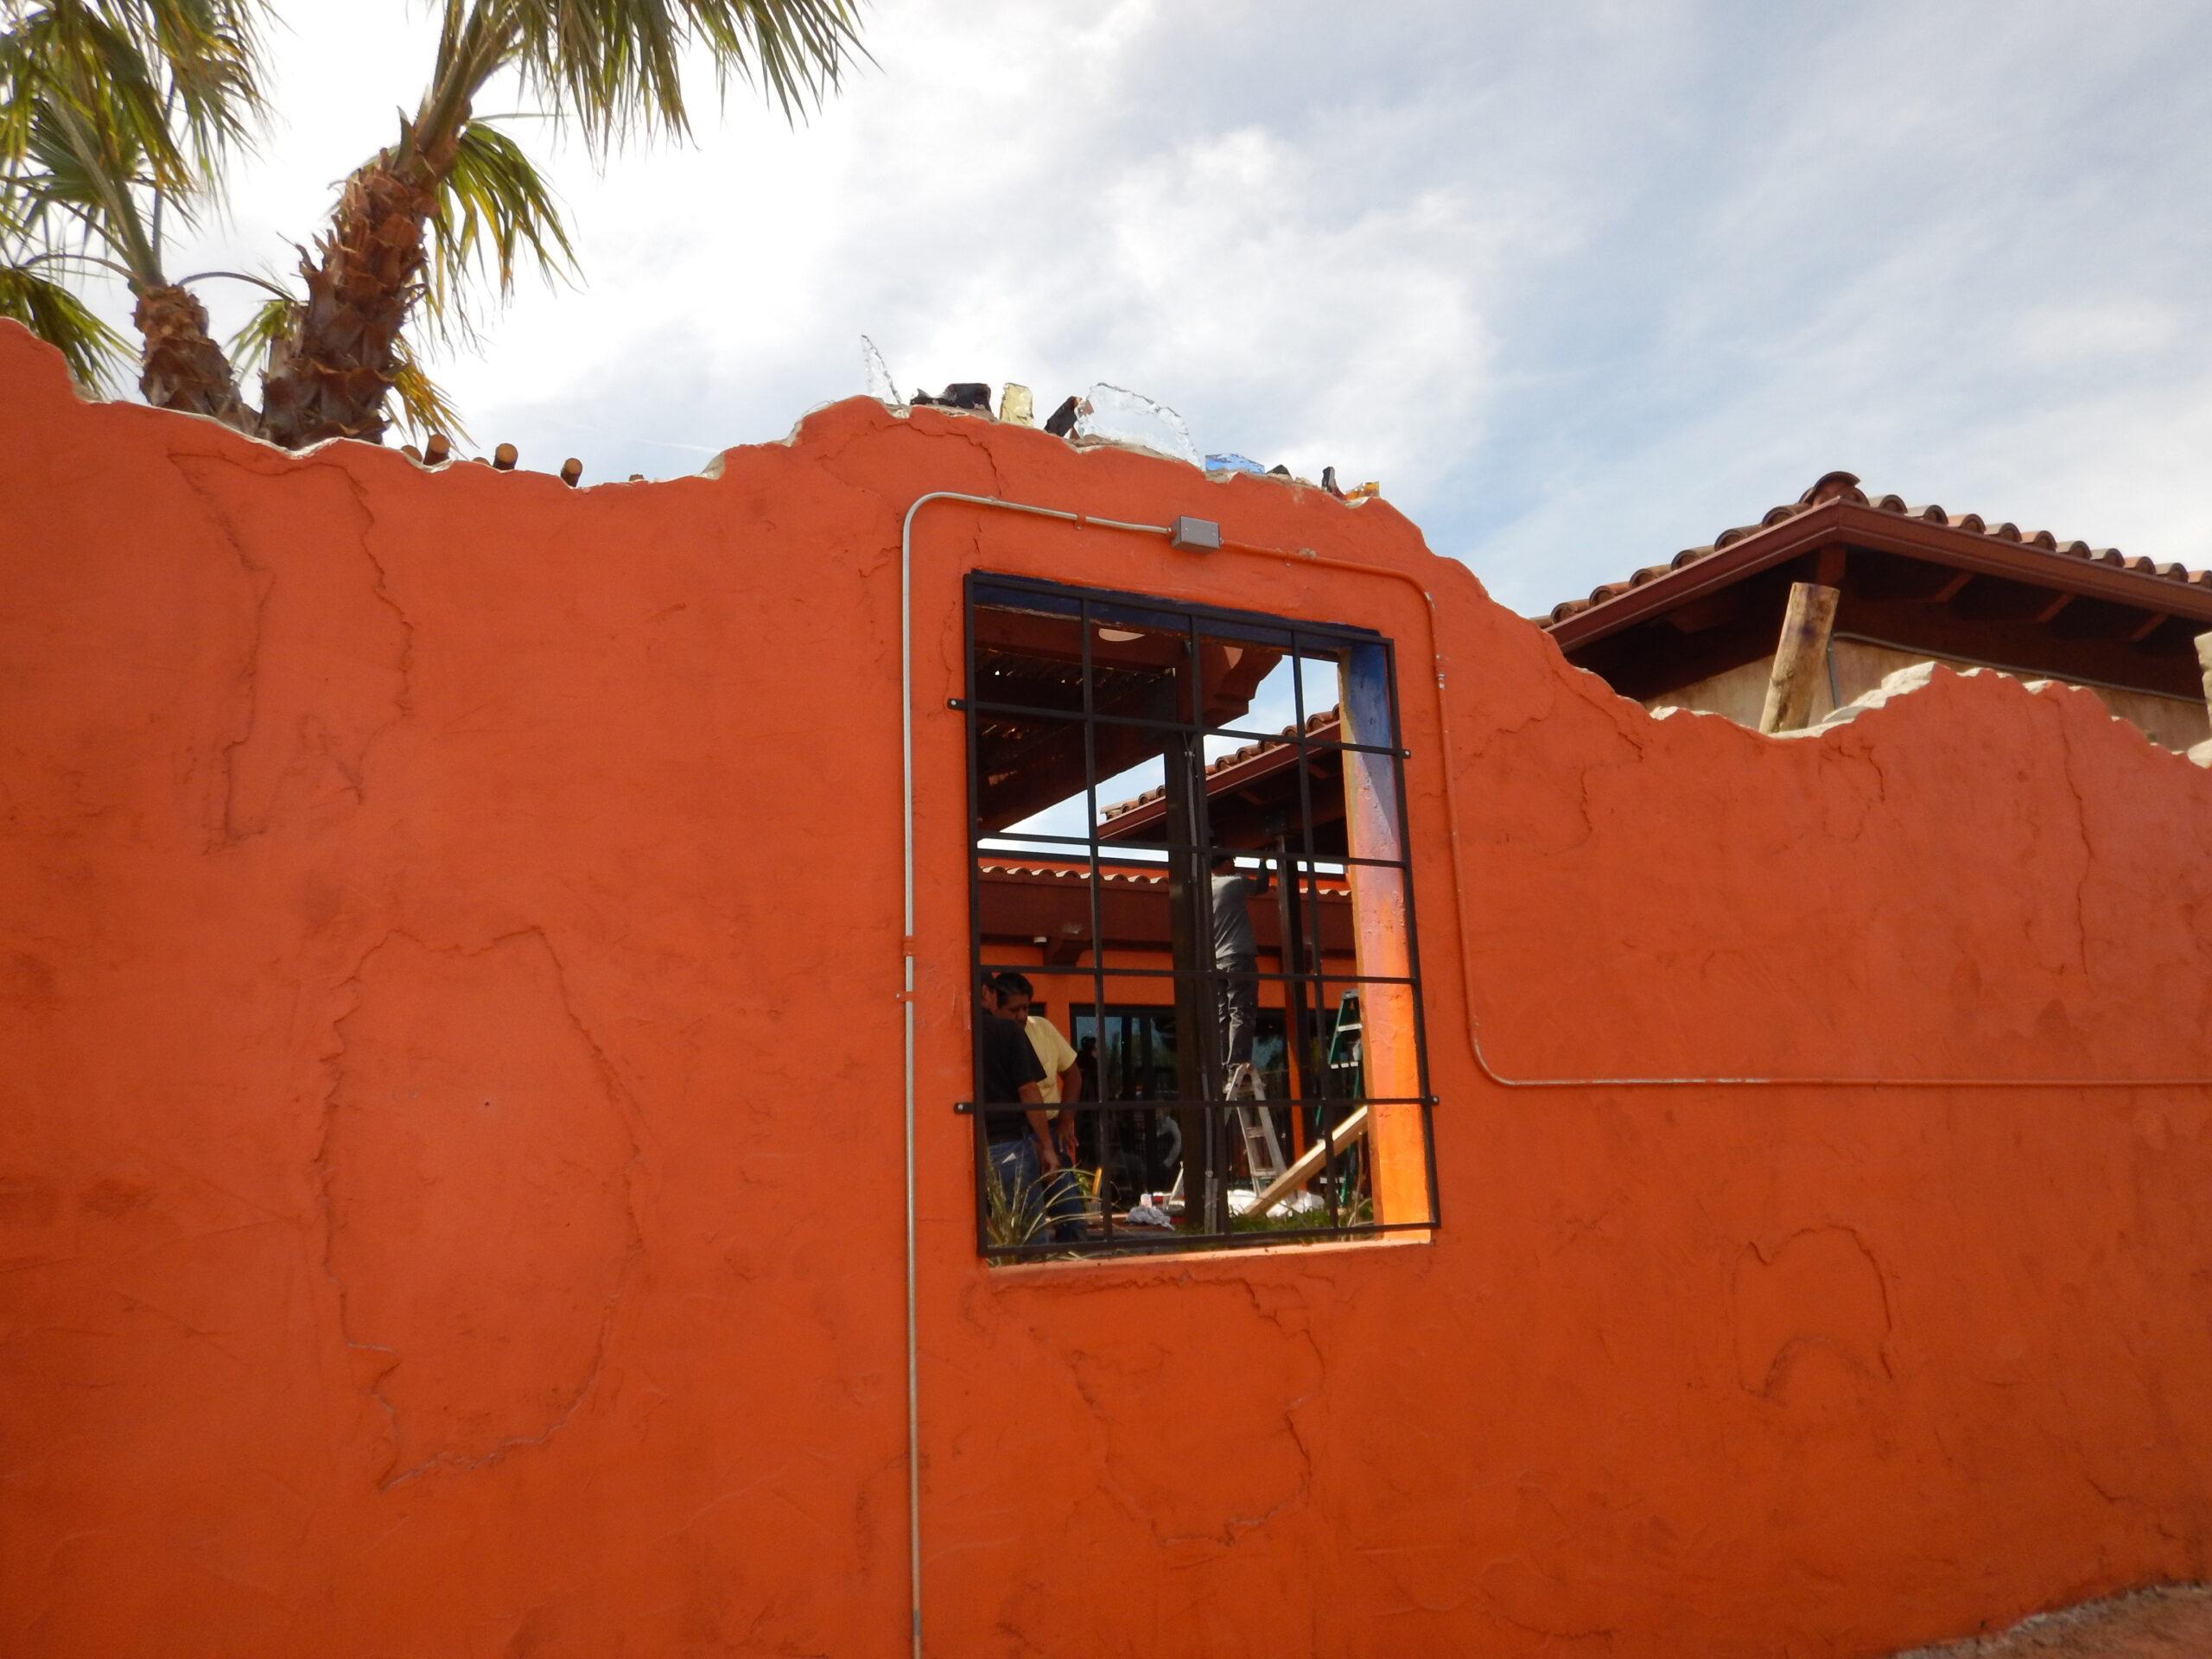 Miguel's-Restaurant-Midland-TX-Steel-commercial-Main-Door-Entry-windows-railings-lighting-Avanti-OLS-MOD-B003 (5)